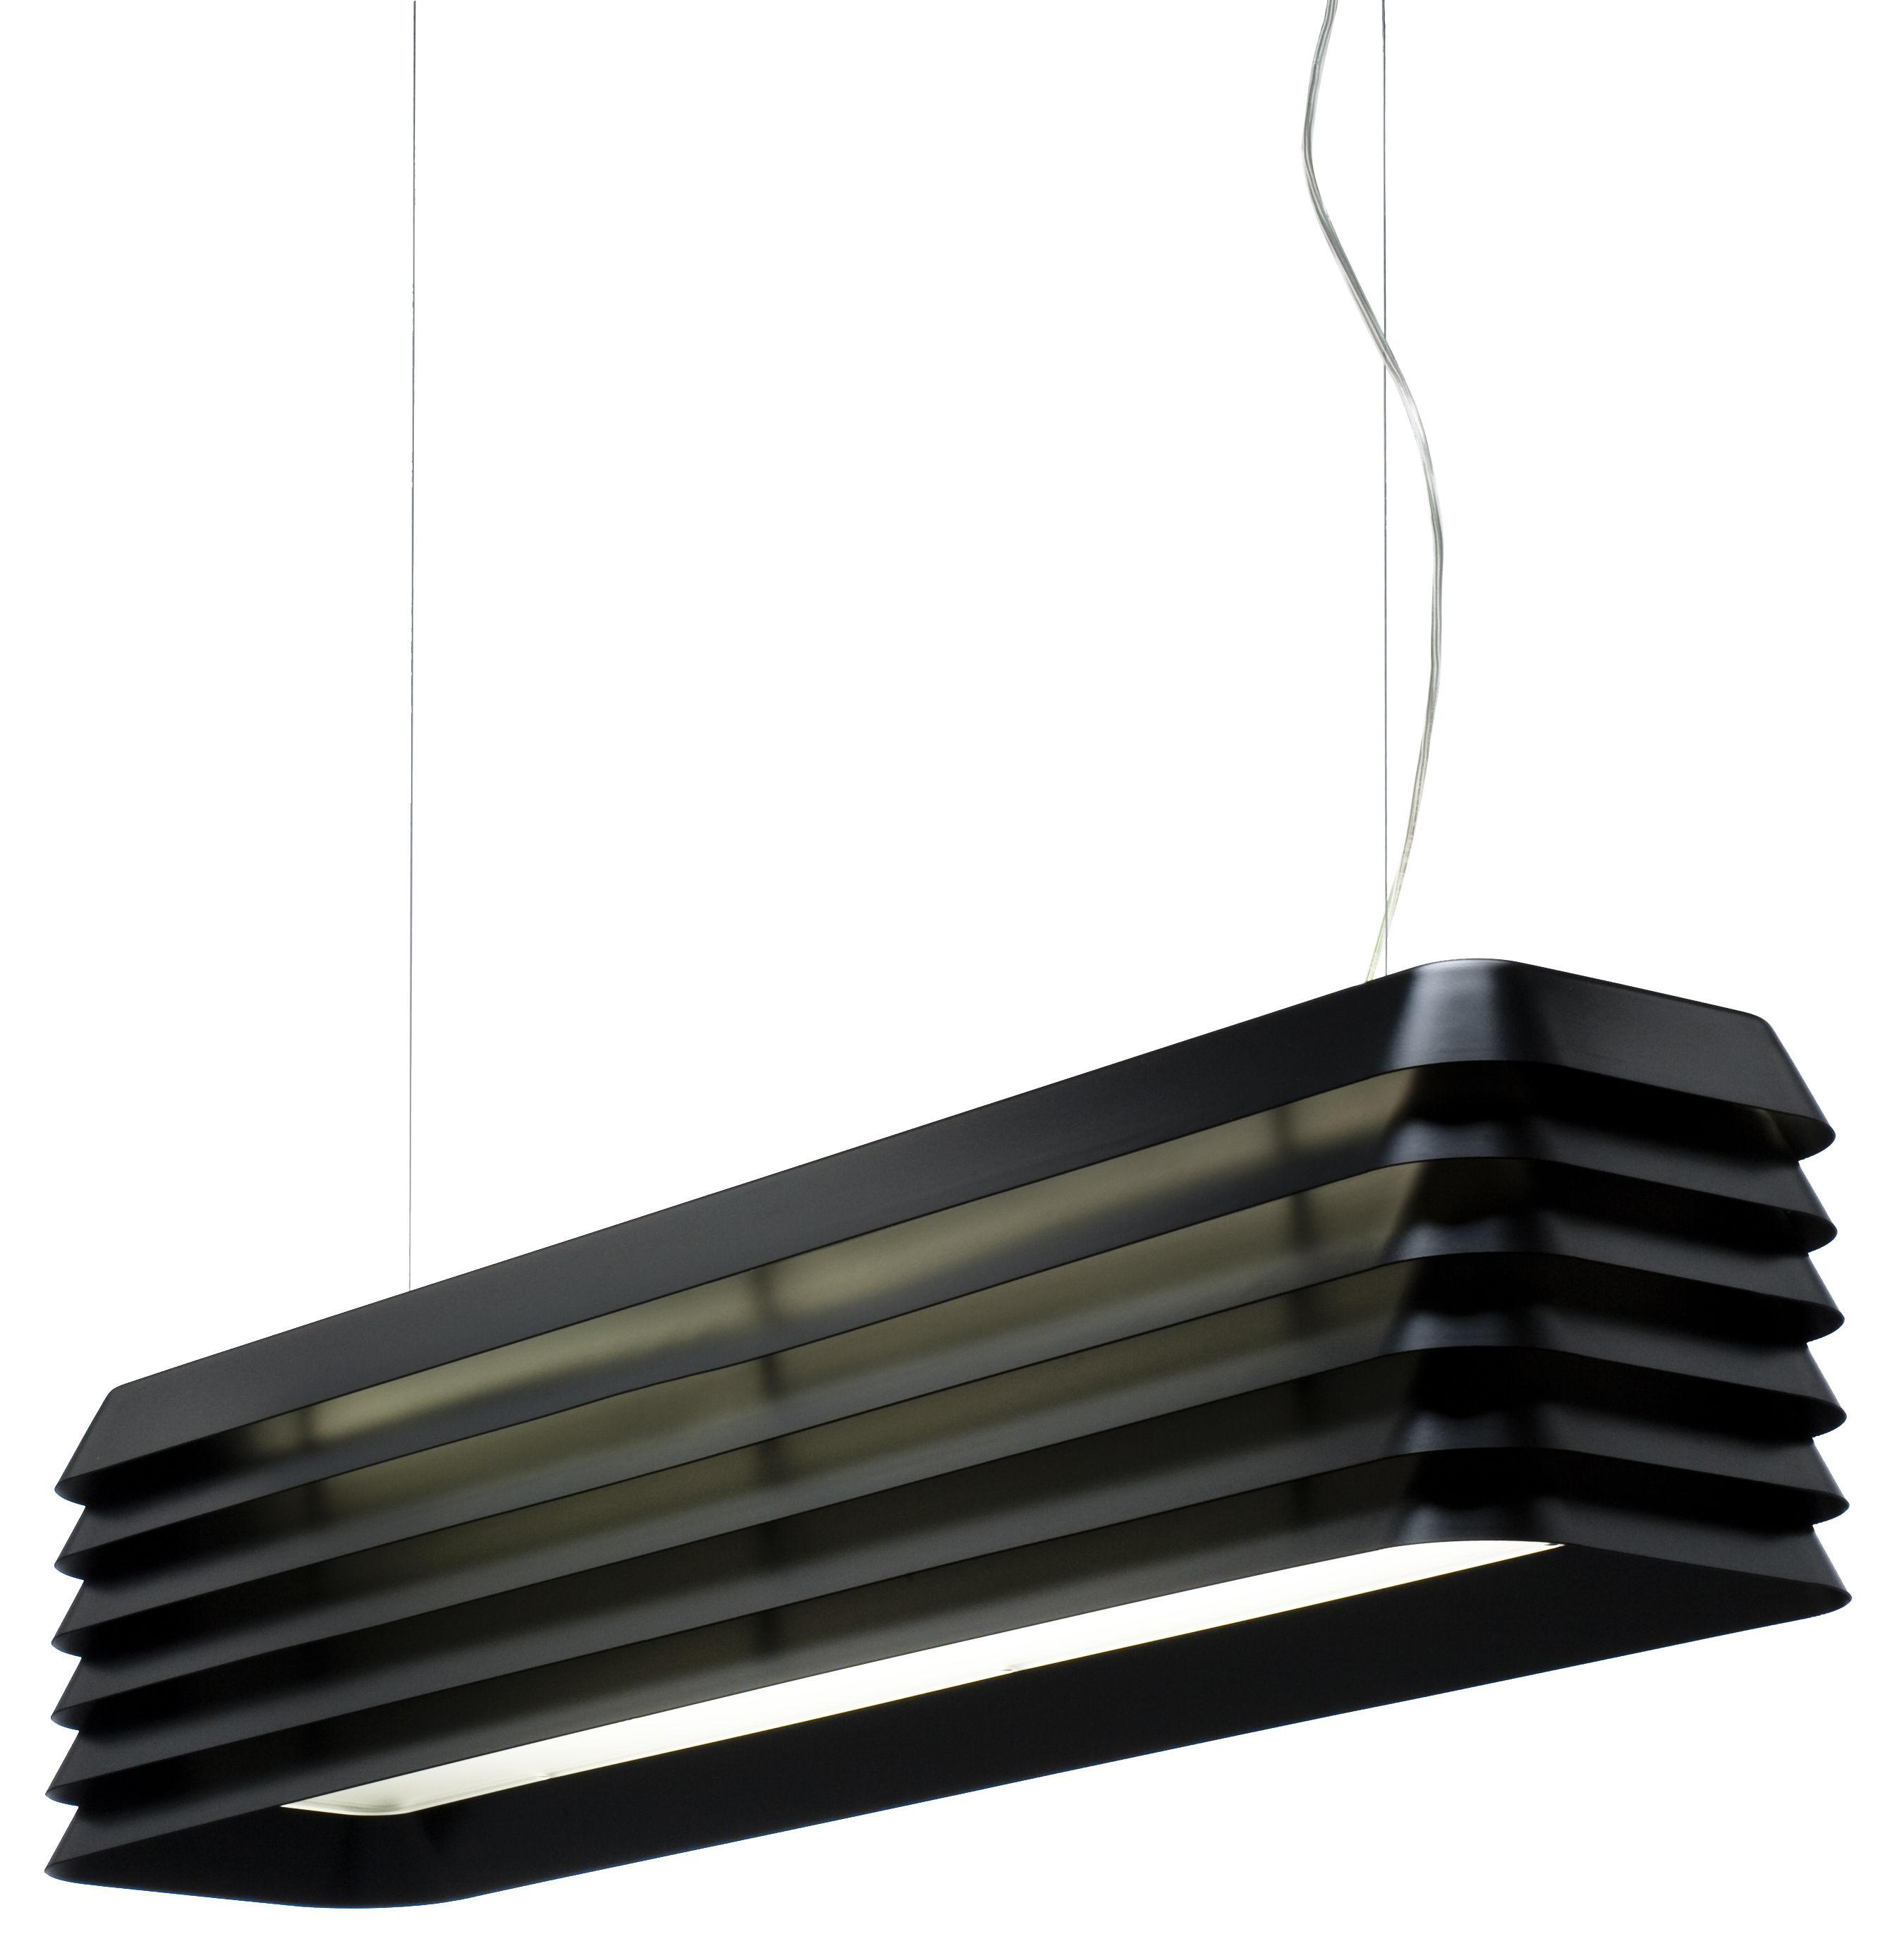 Leuchten - Pendelleuchten - Louvre Light Pendelleuchte - Established & Sons - Schwarz eloxiert - eloxiertes Aluminium